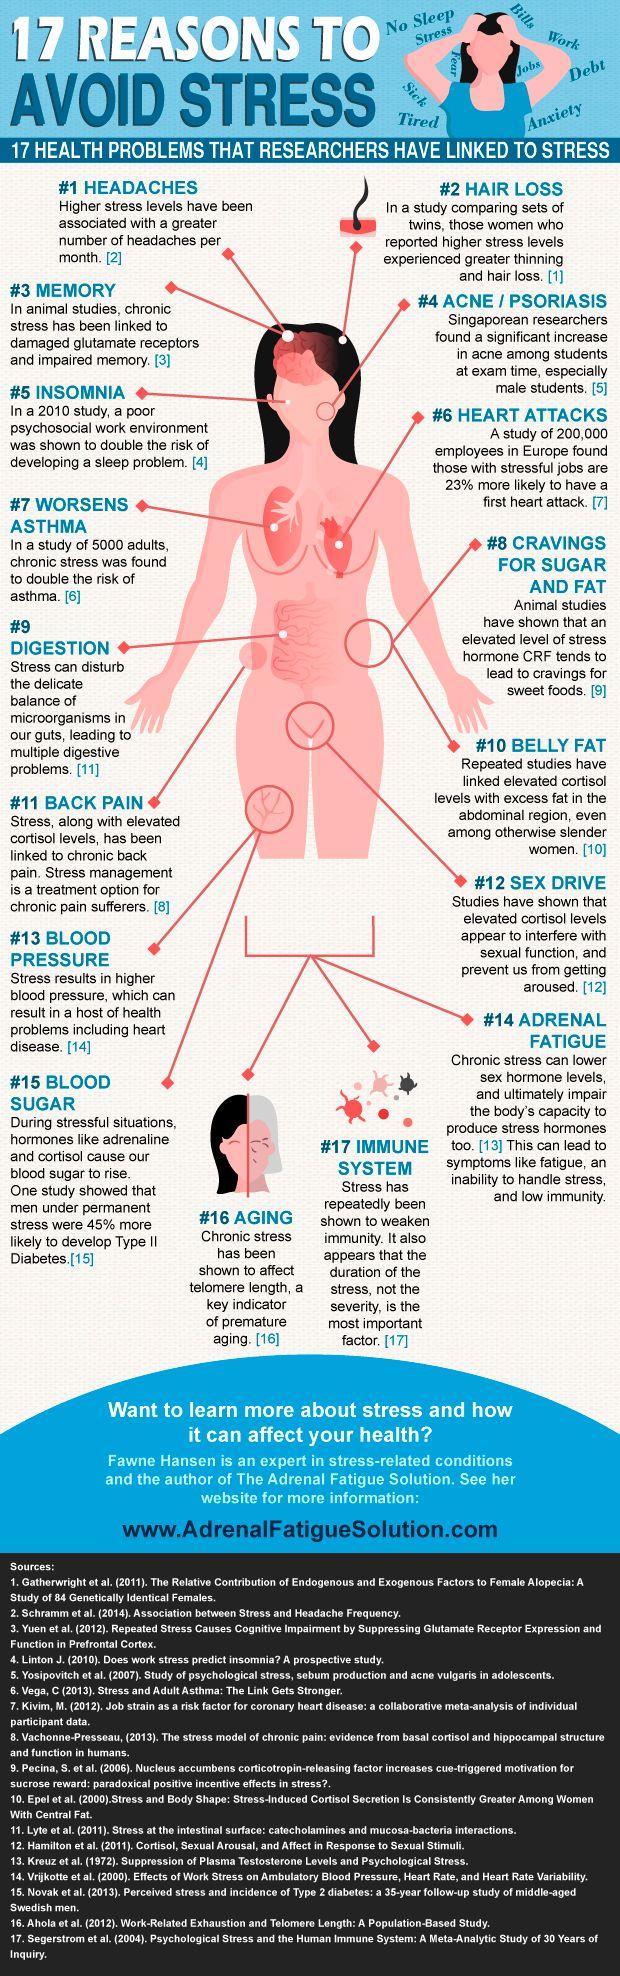 http://www.mindbodygreen.com/0-13969/17-reasons-to-avoid-stress-infographic.html